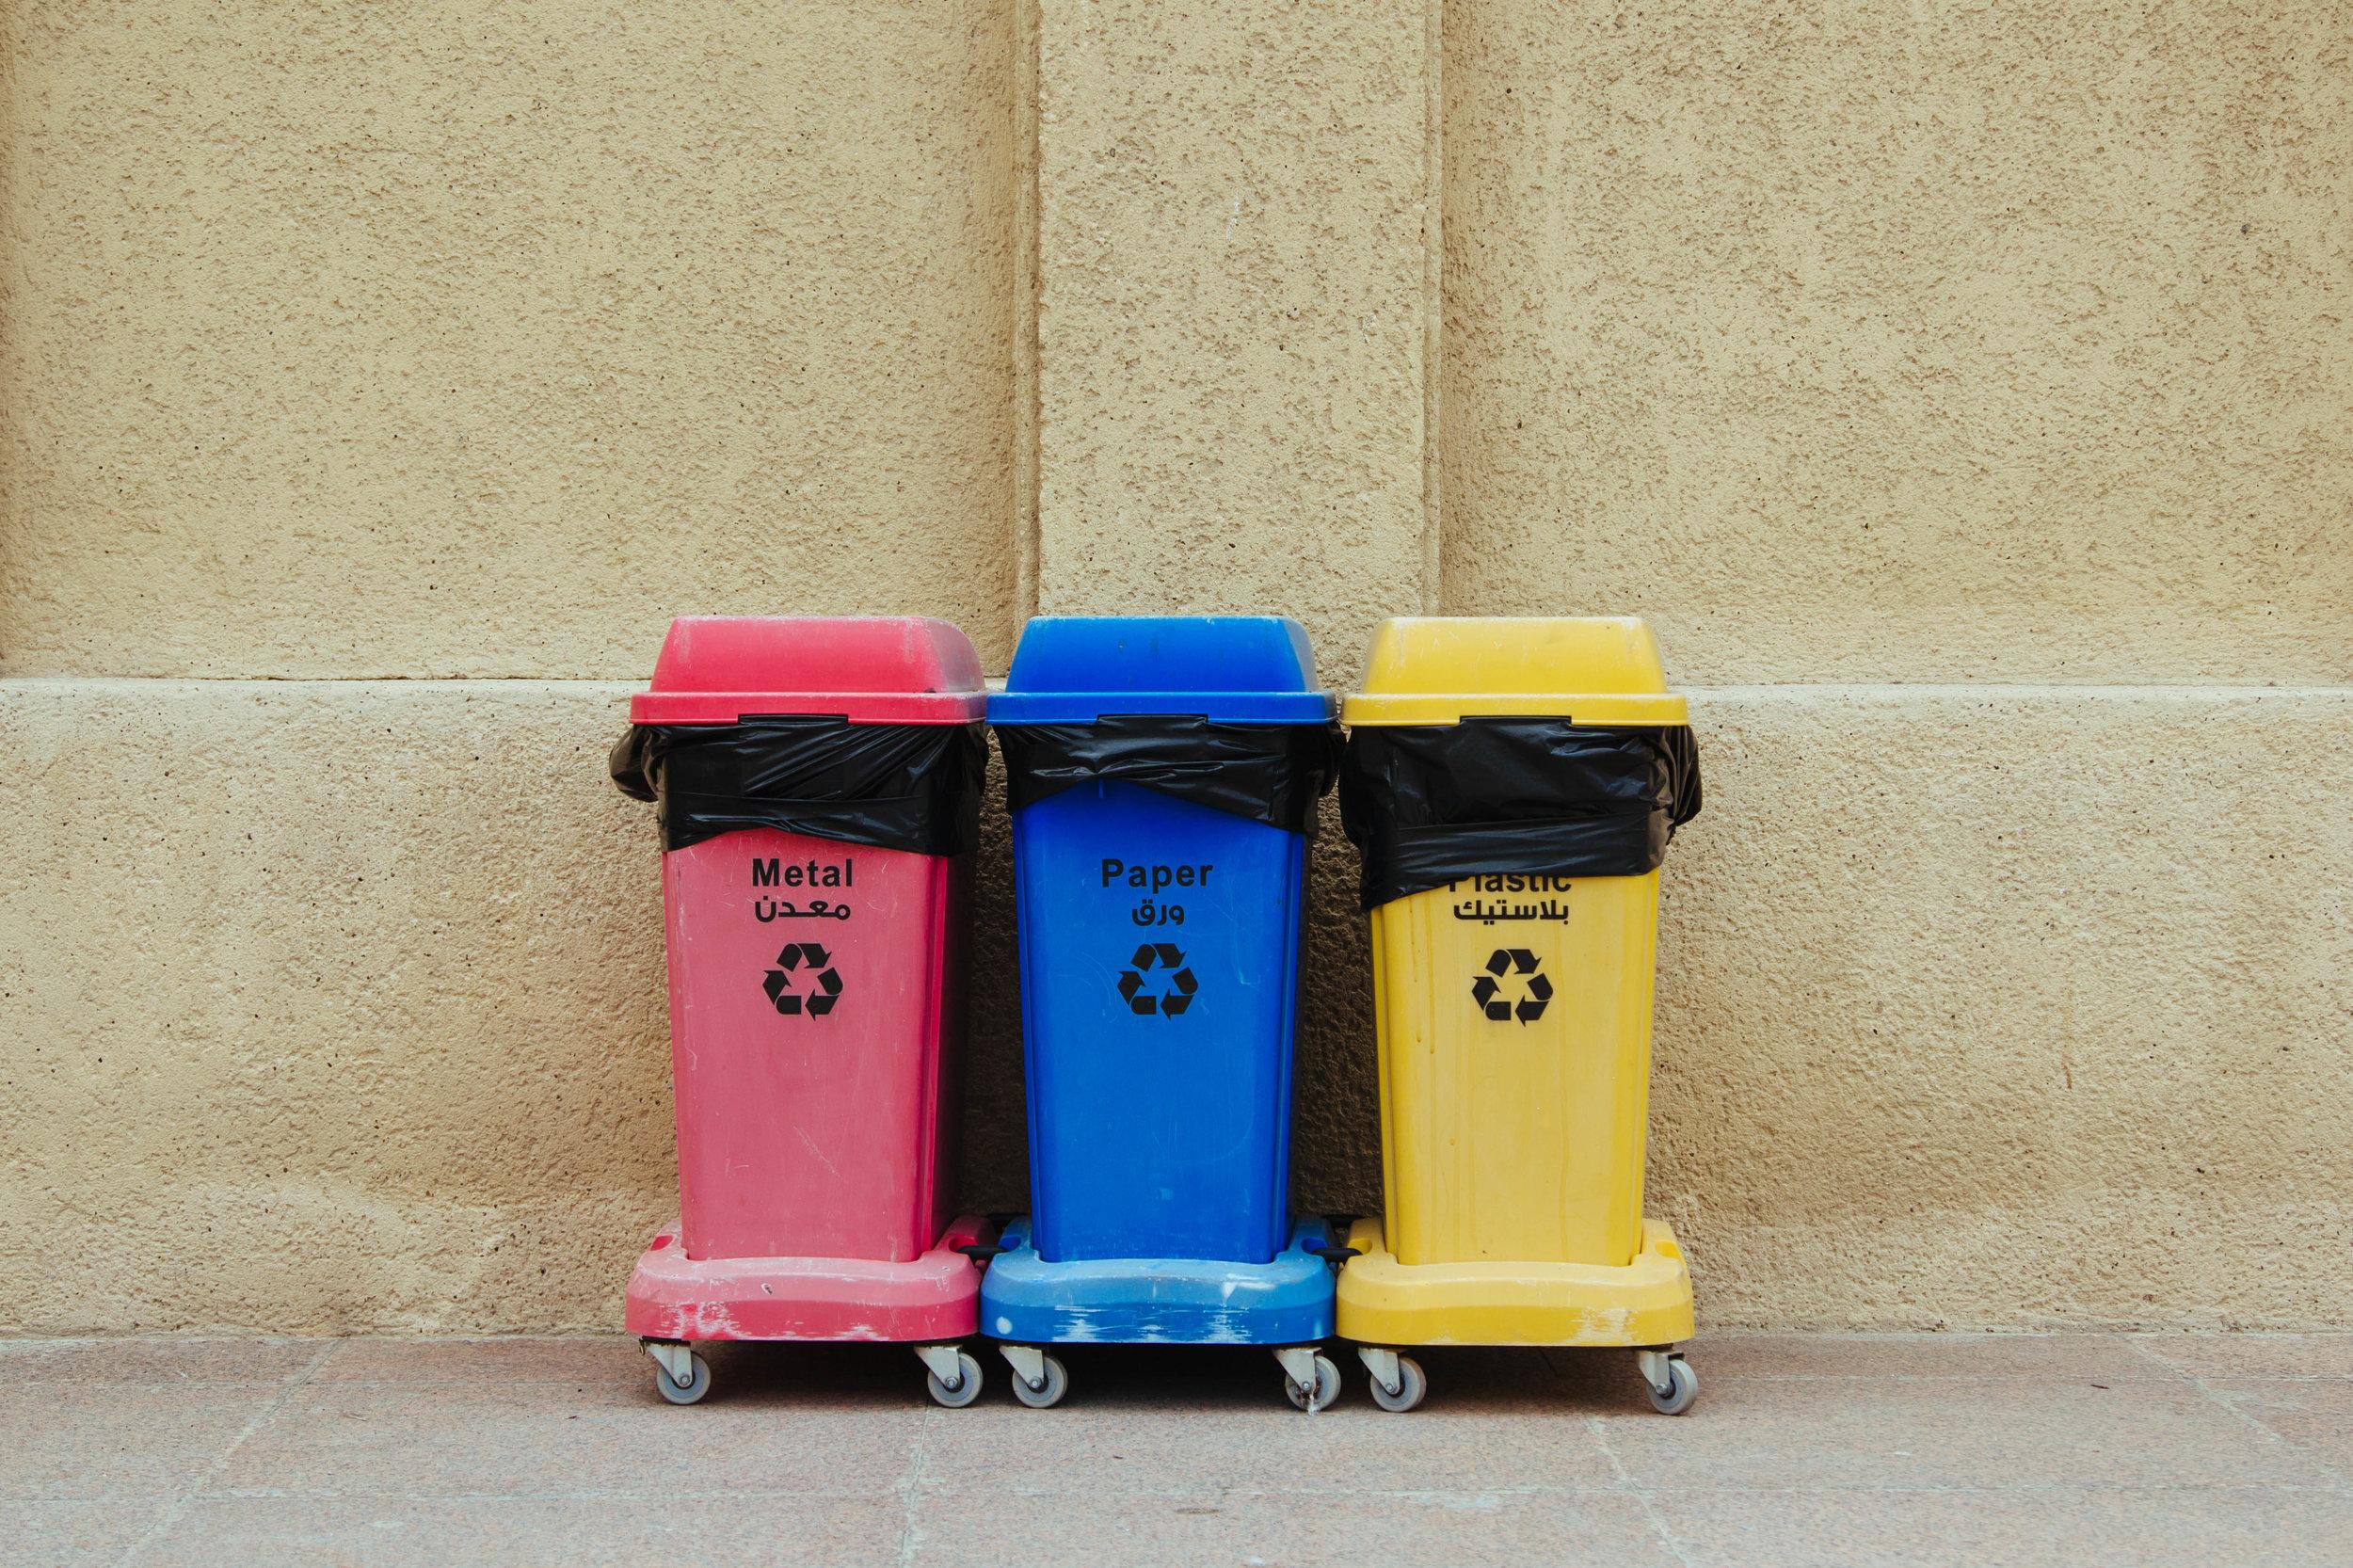 Garbage rubbish bins